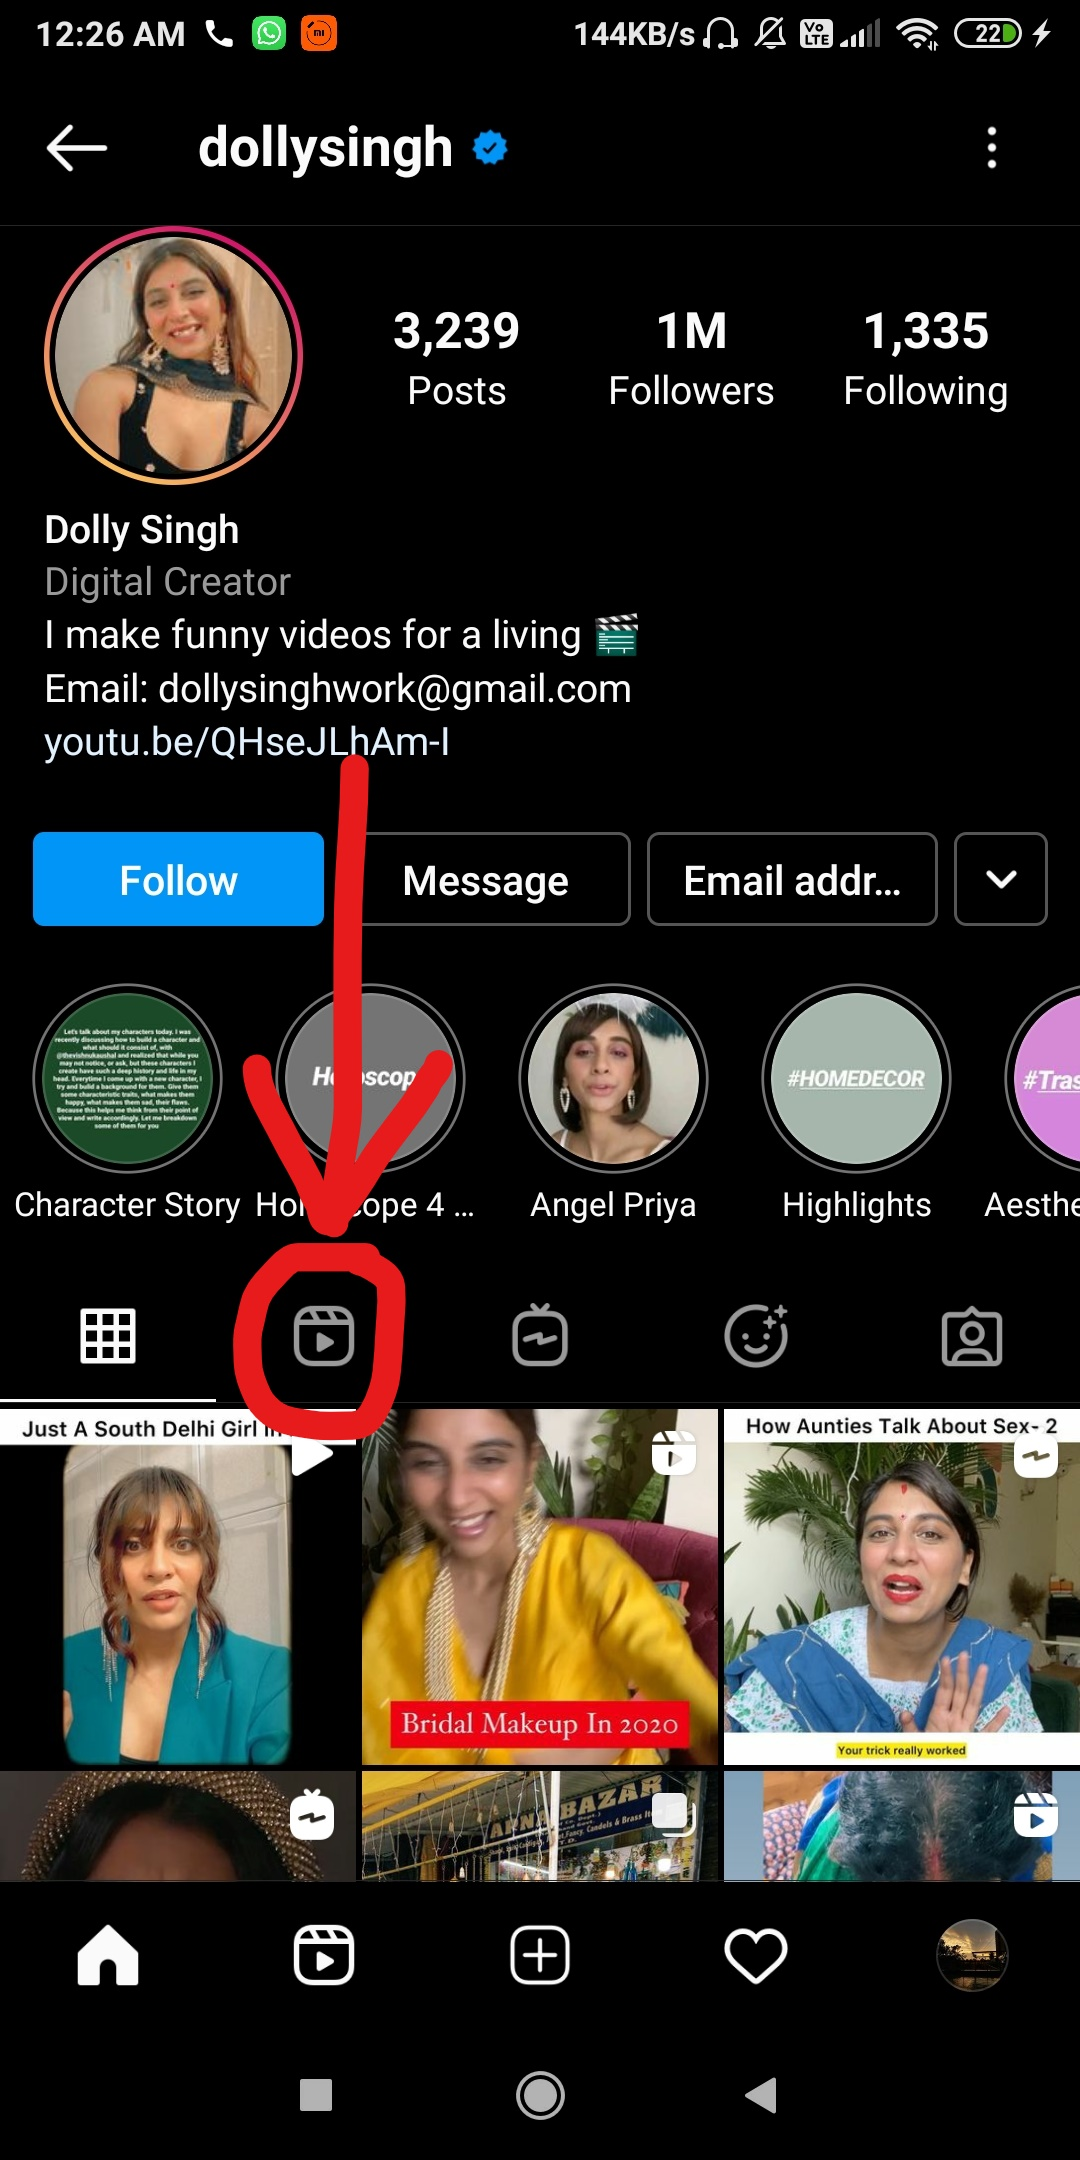 Reels On Profile  - Reels on Profile - How To Watch Reels On Instagram?